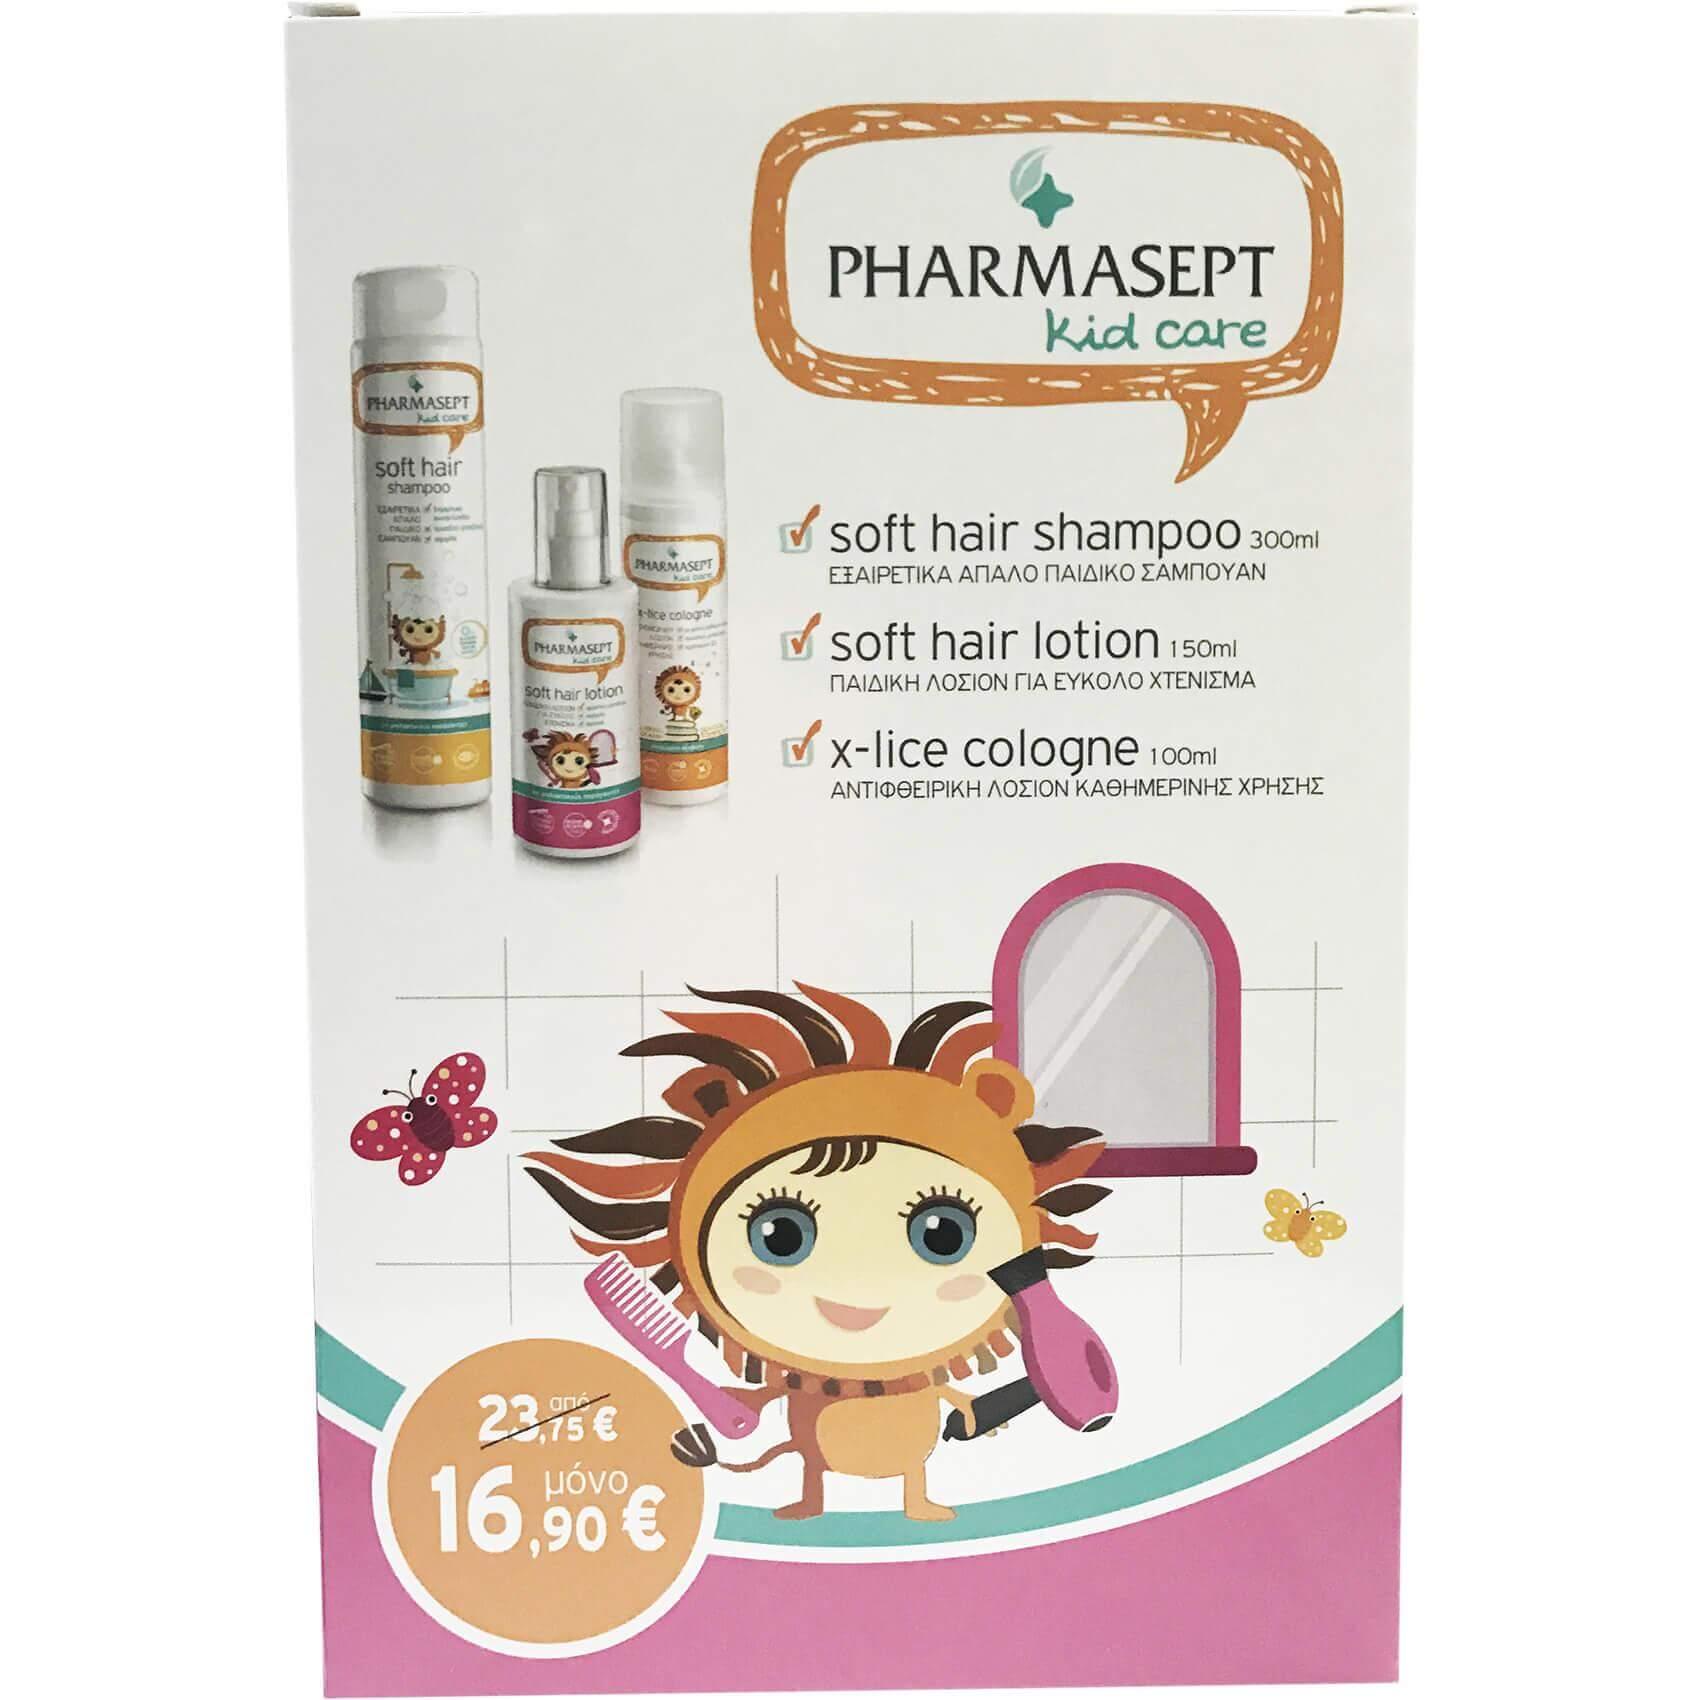 Pharmasept Promo Pack Girl Kid Care Soft Hair Shampoo 300ml & X-Lice Cologne 100ml & Soft Hair Lotion 150ml